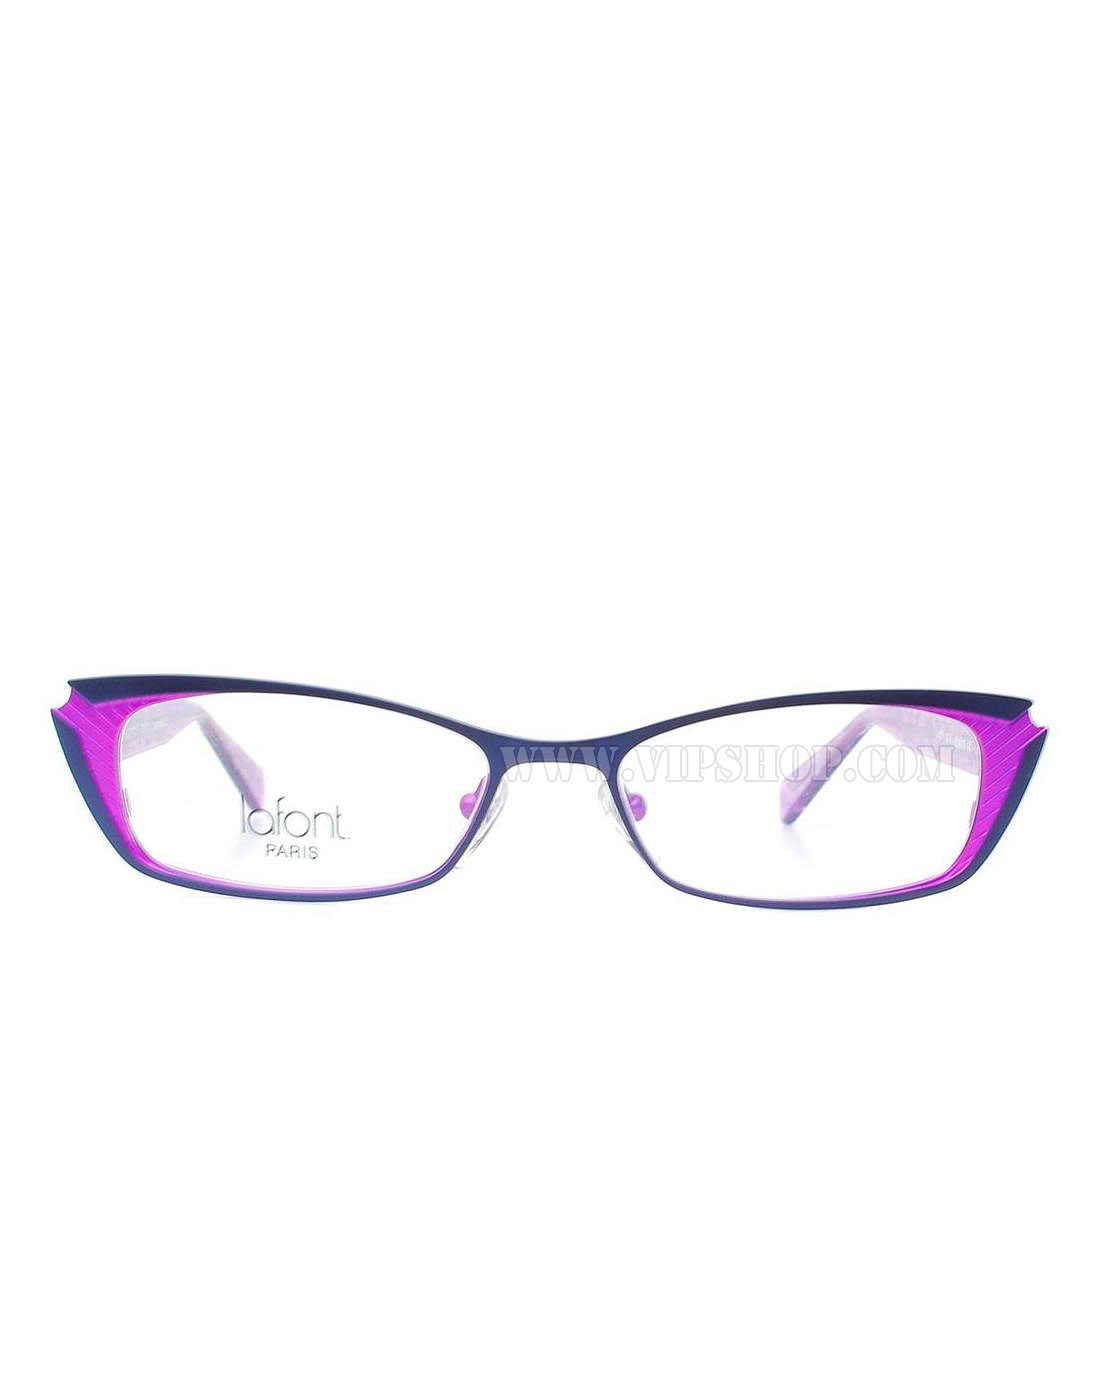 lafont 女款可爱紫色眼镜架